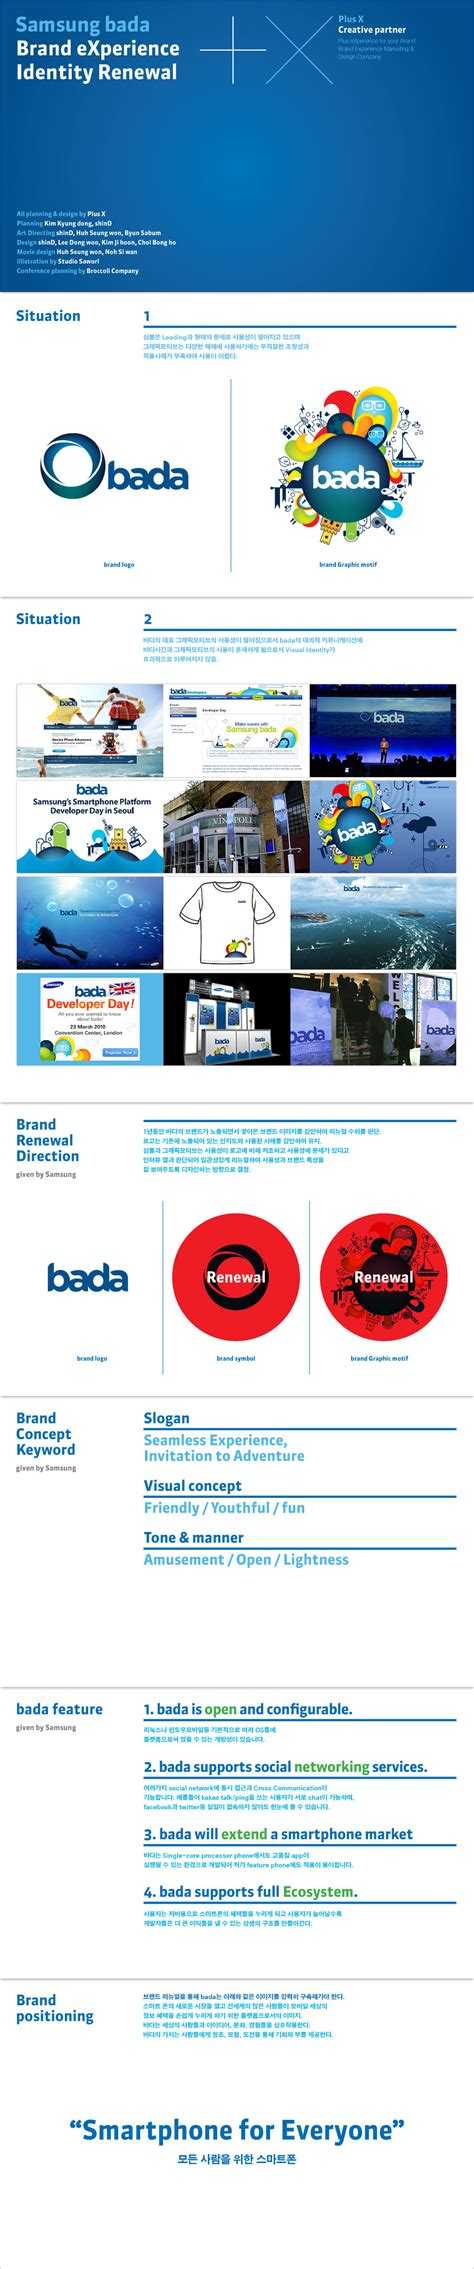 Samsung Ji Ac sabum byun samsung bada brand experience identity renewal